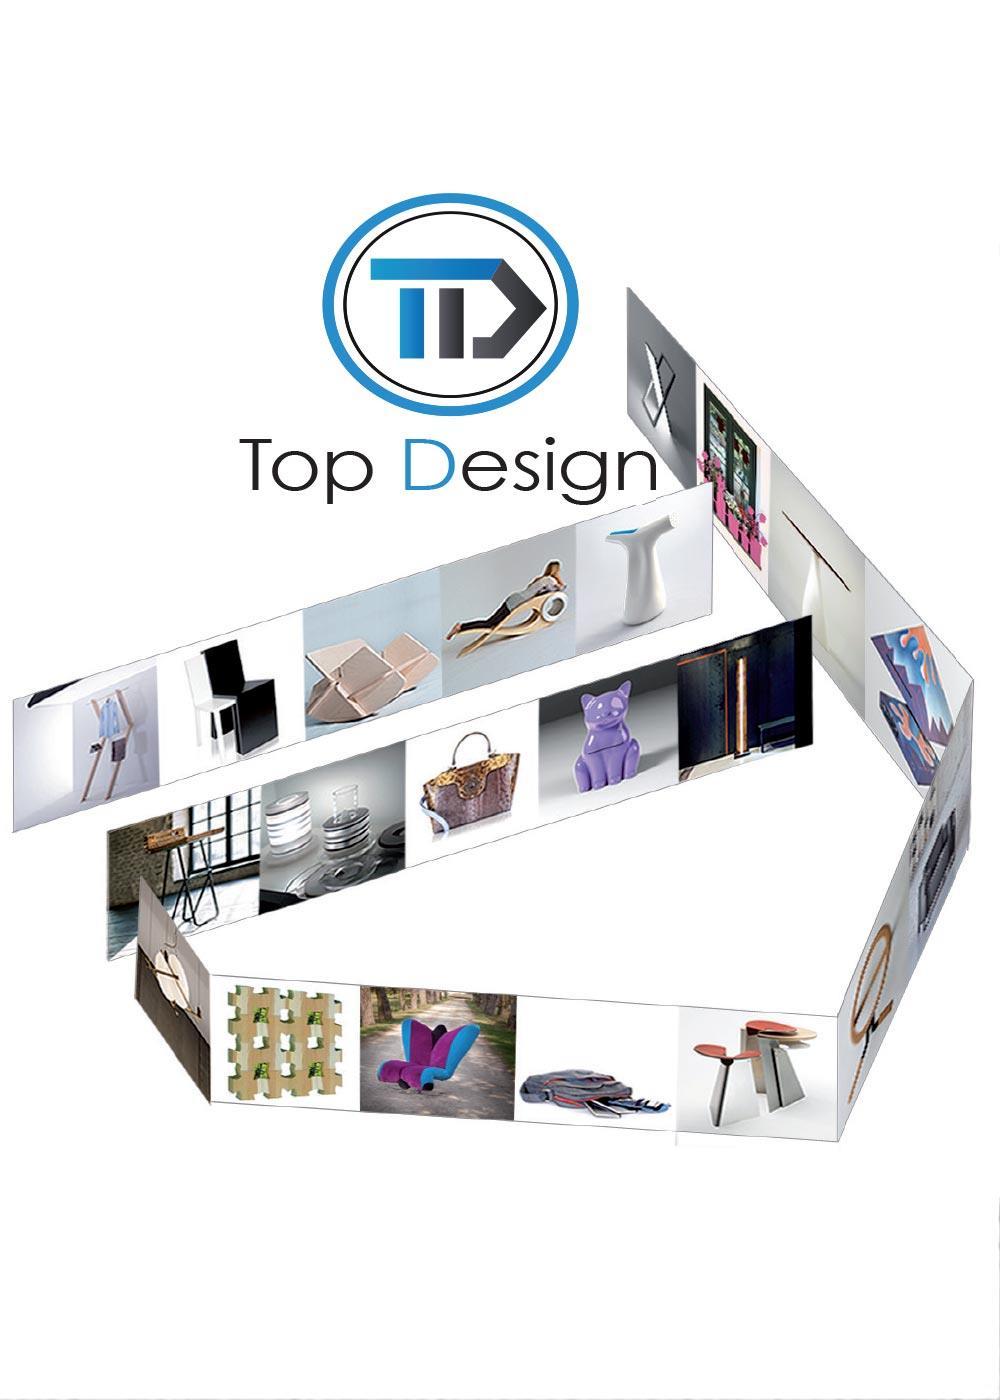 Top Design - Volume Zero